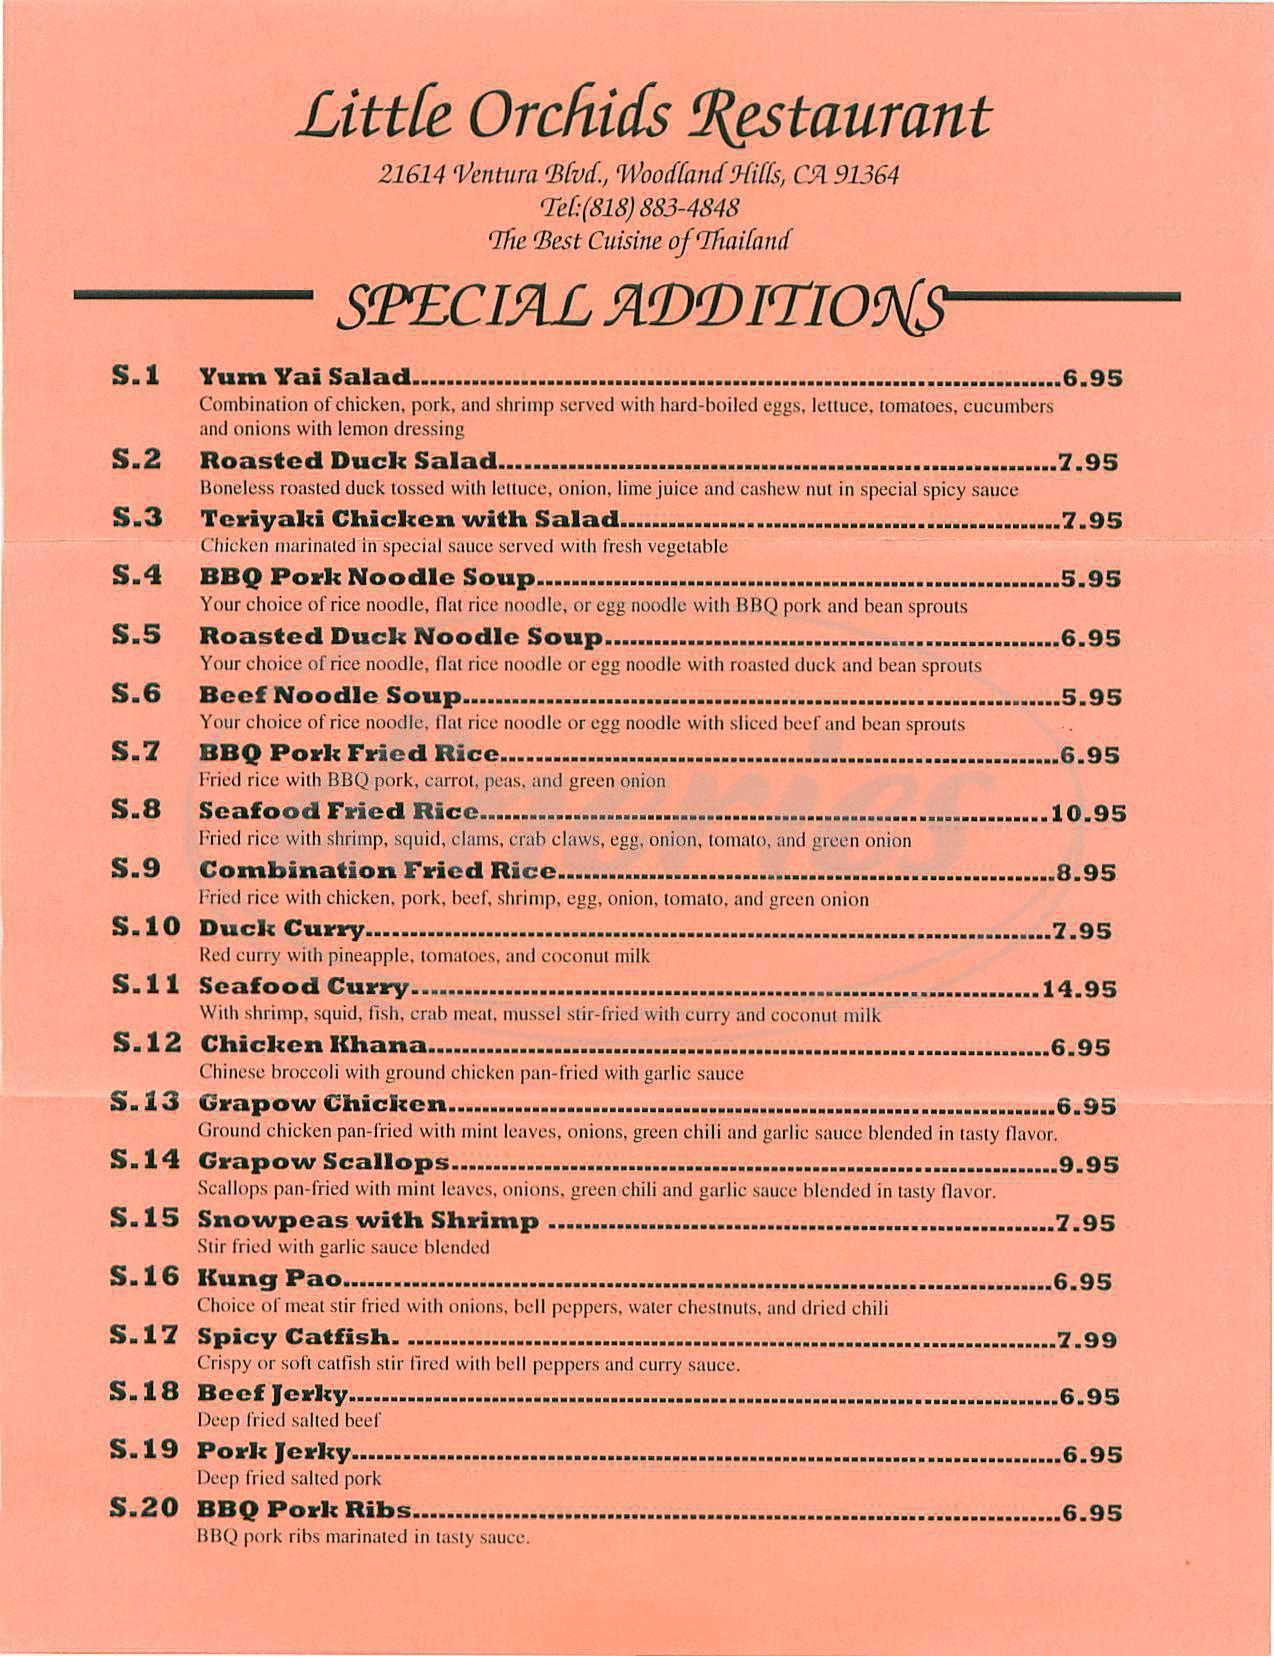 menu for Little Orchids Restaurant